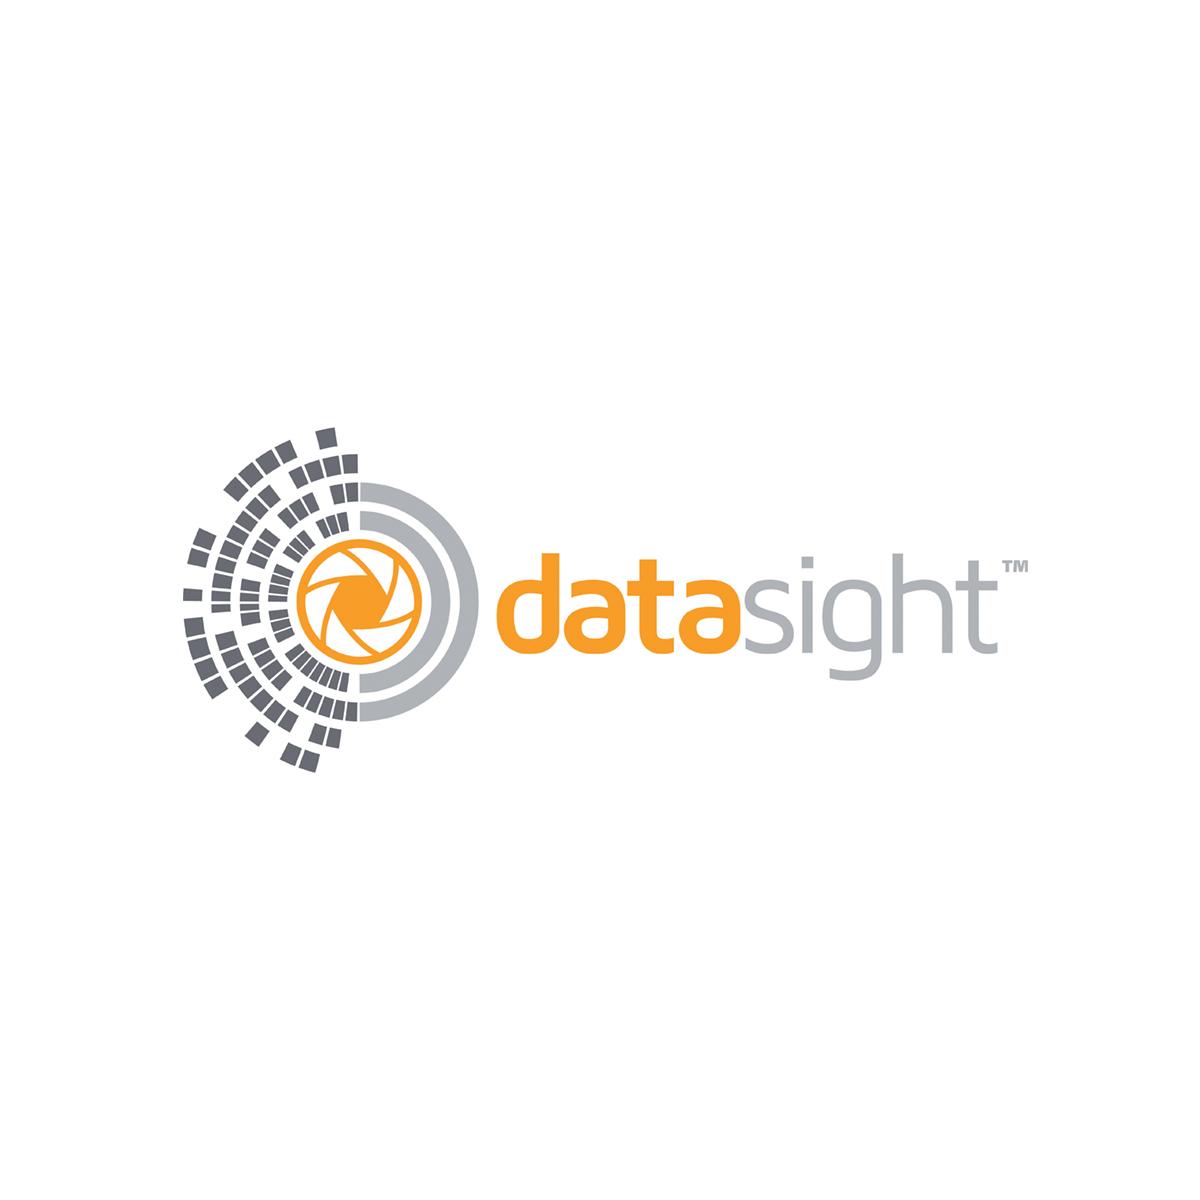 Datasight logo.jpg